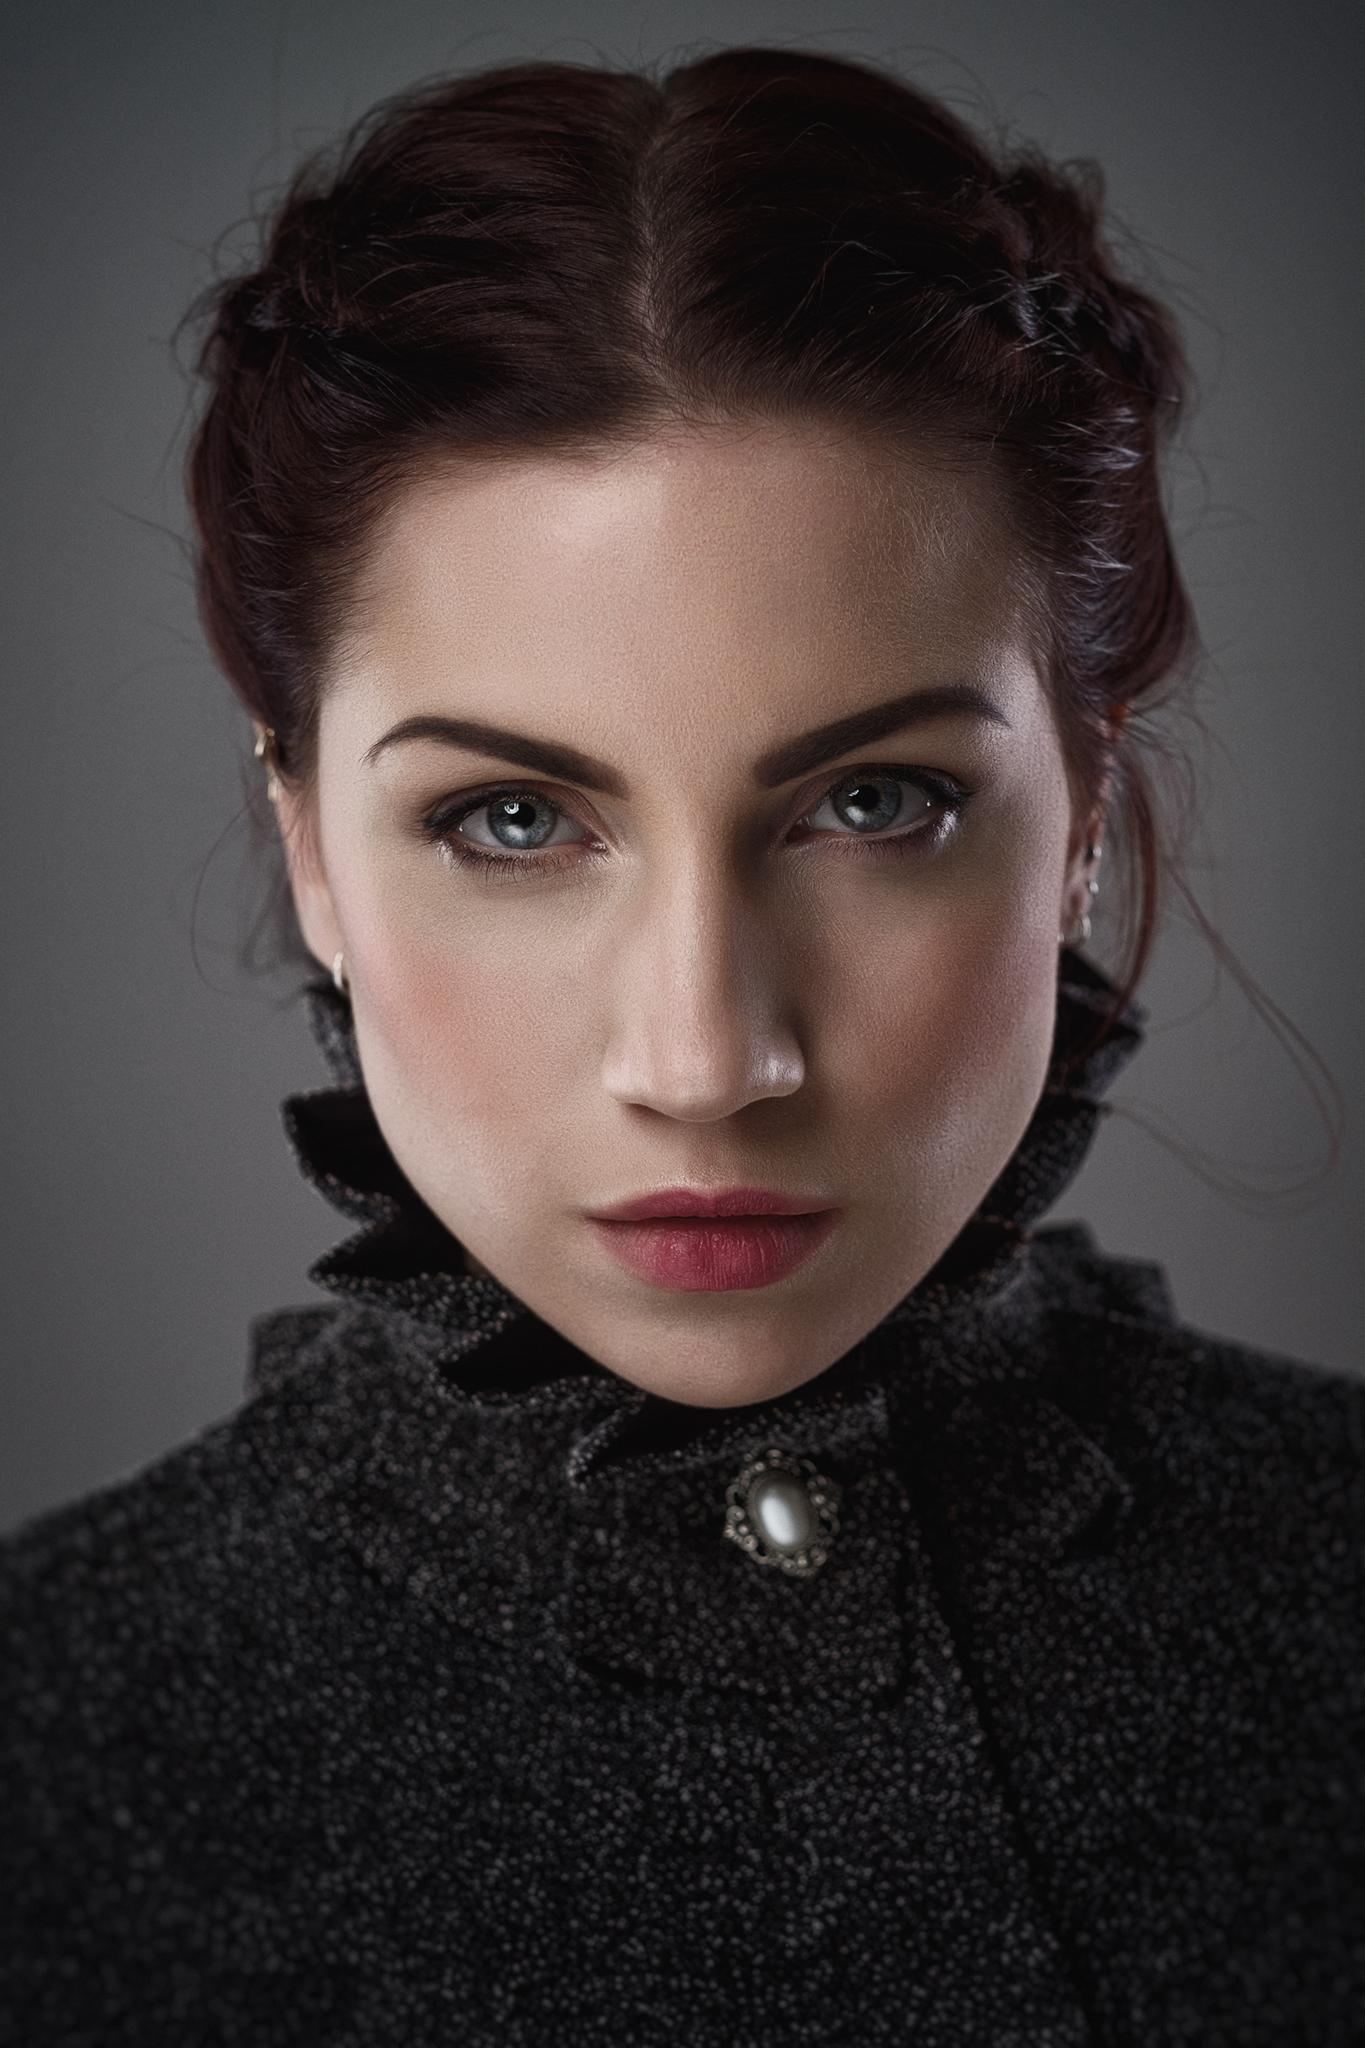 Model: Emma Hansson MUA: Moa Markusson